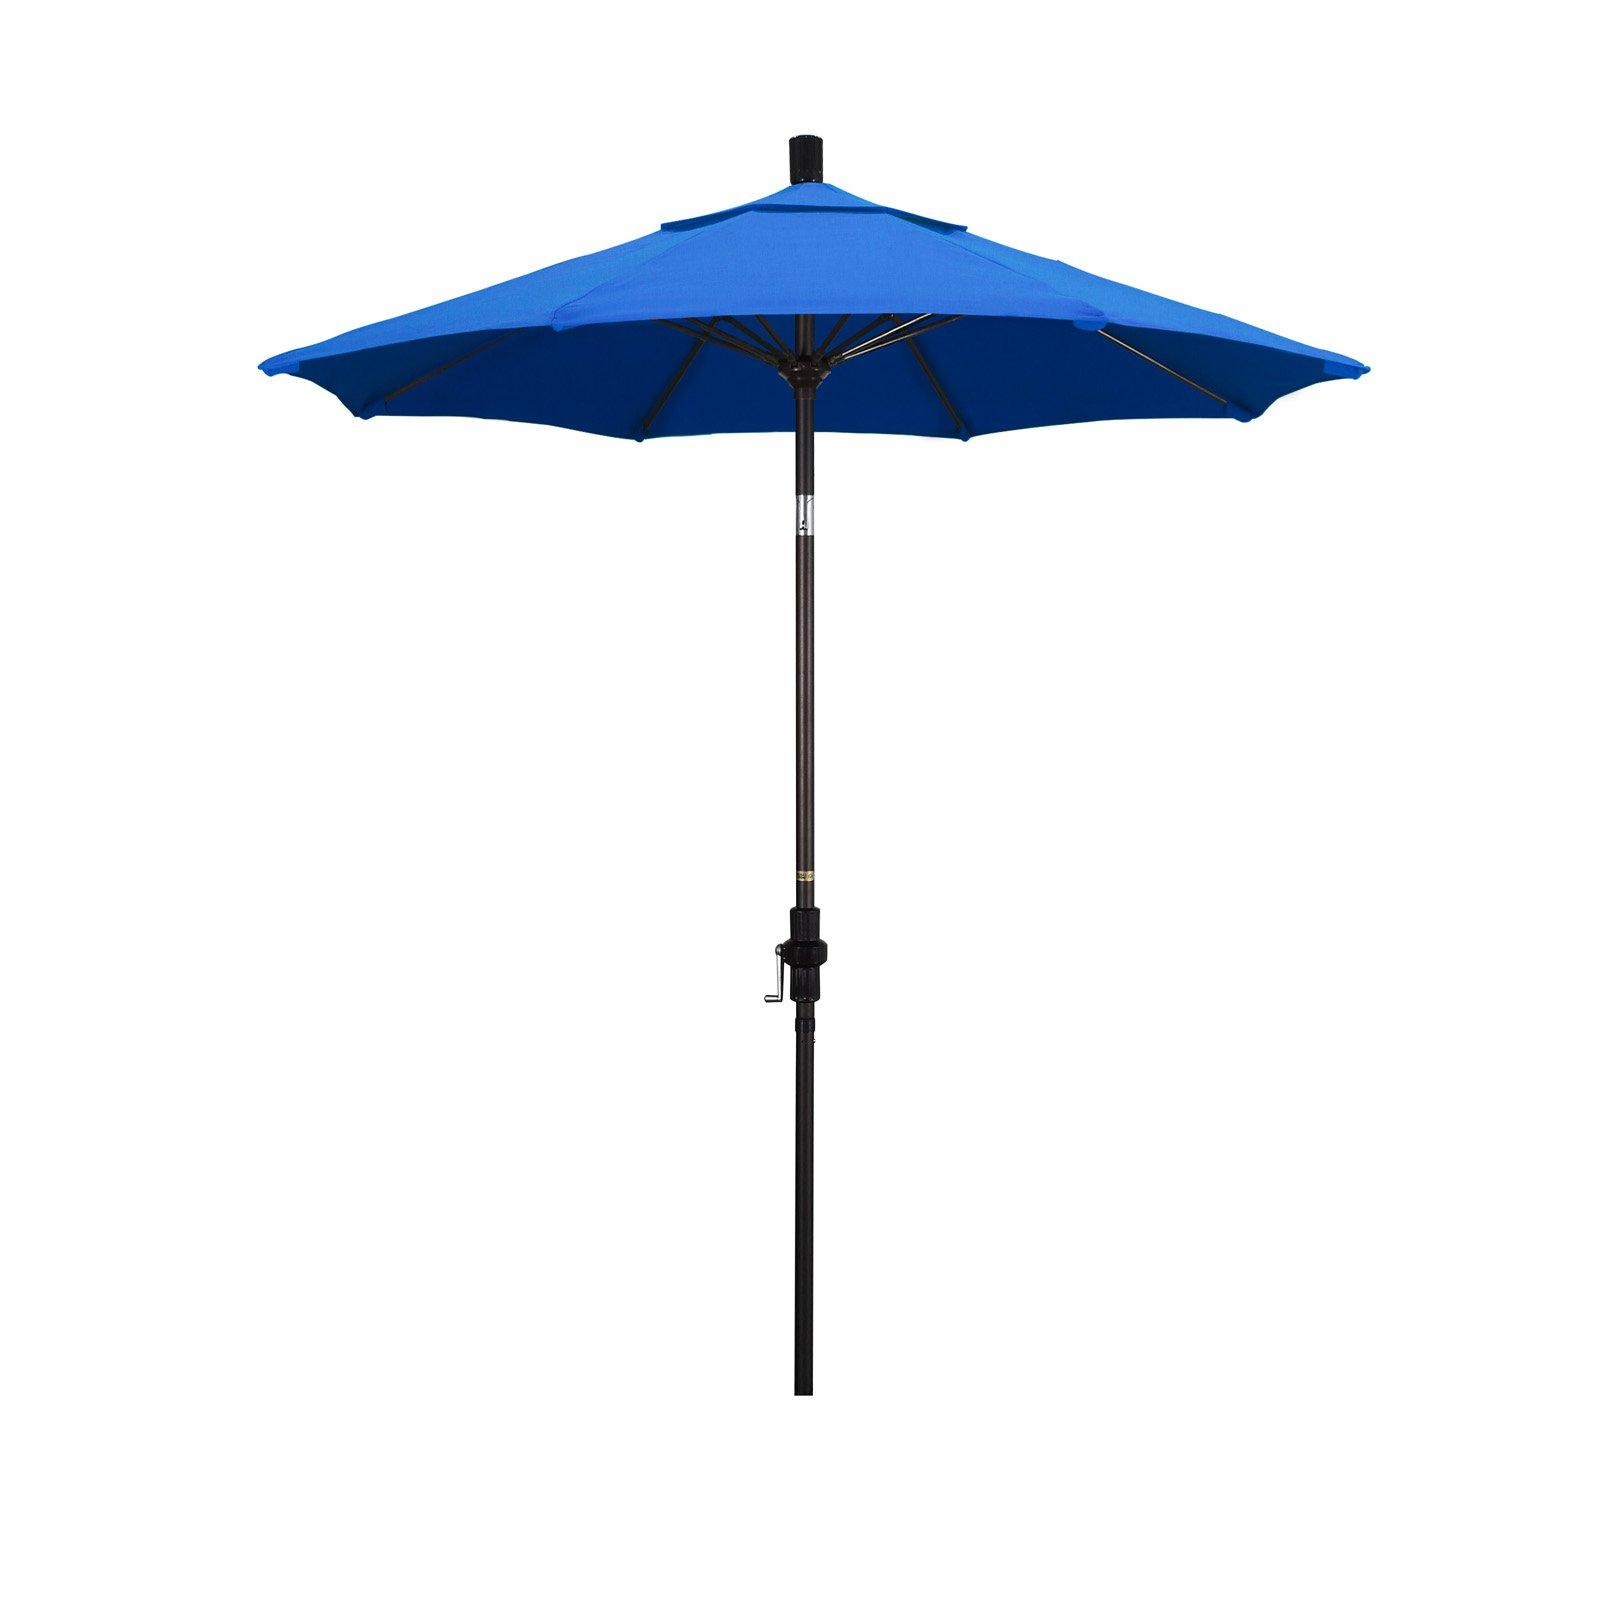 Newest Muldoon Market Umbrellas Within California Umbrella 7.5 Ft. Aluminum Collar Tilt Olefin Patio (Gallery 8 of 20)